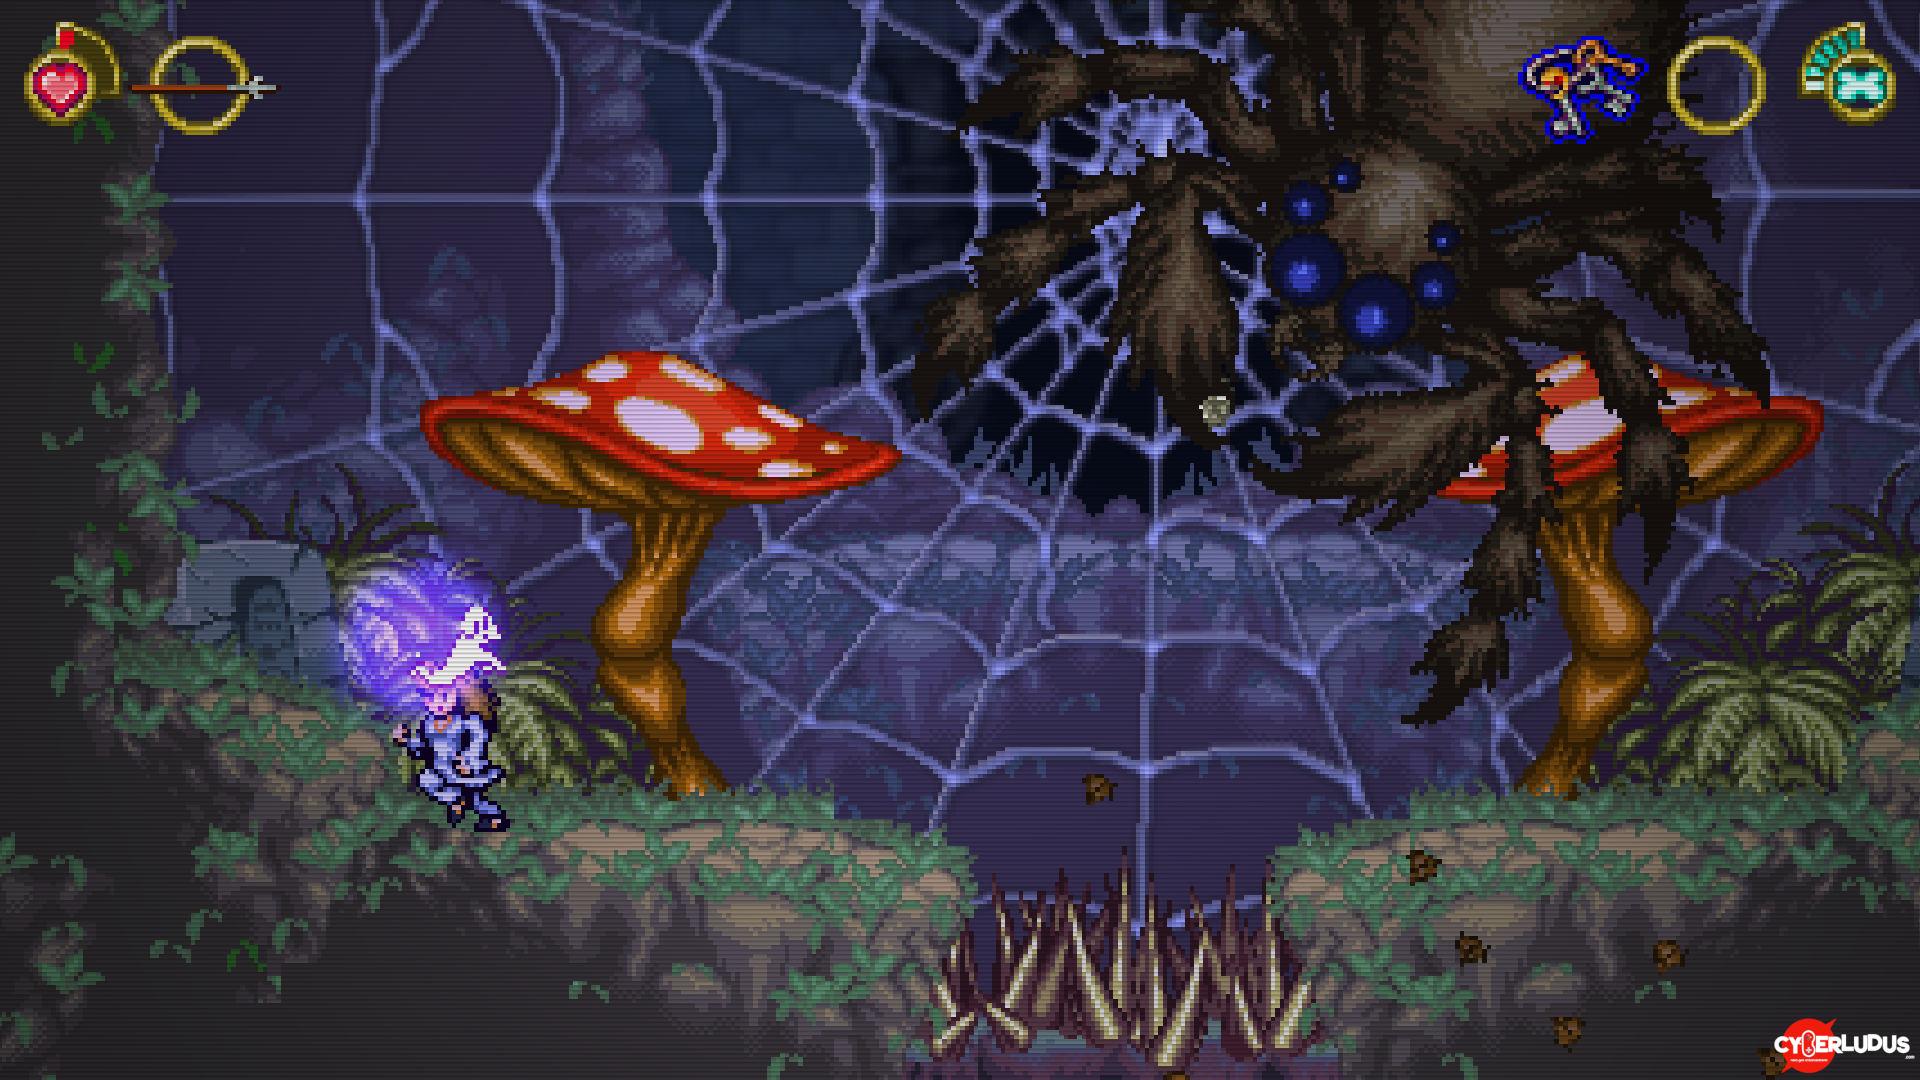 Battle-Princess-Madelyn-boss-spider